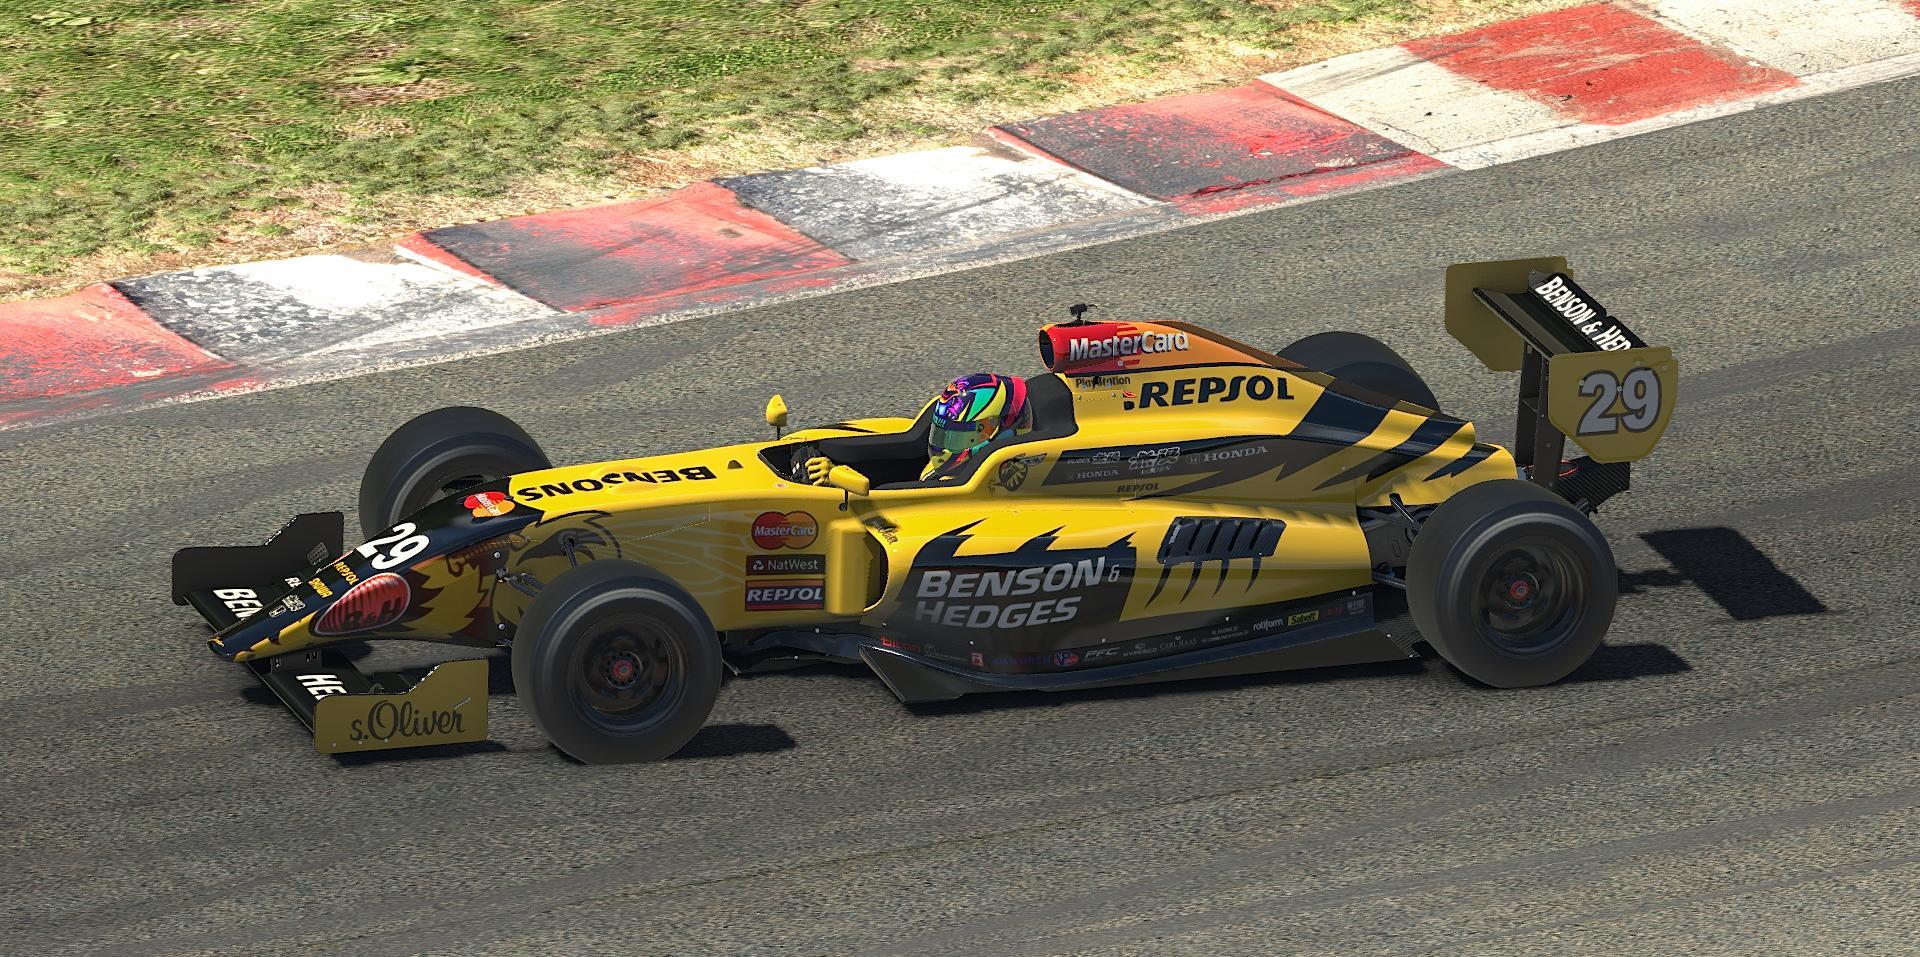 Preview of Jordan 198 - Indy Pro 2000 by Daniel R.